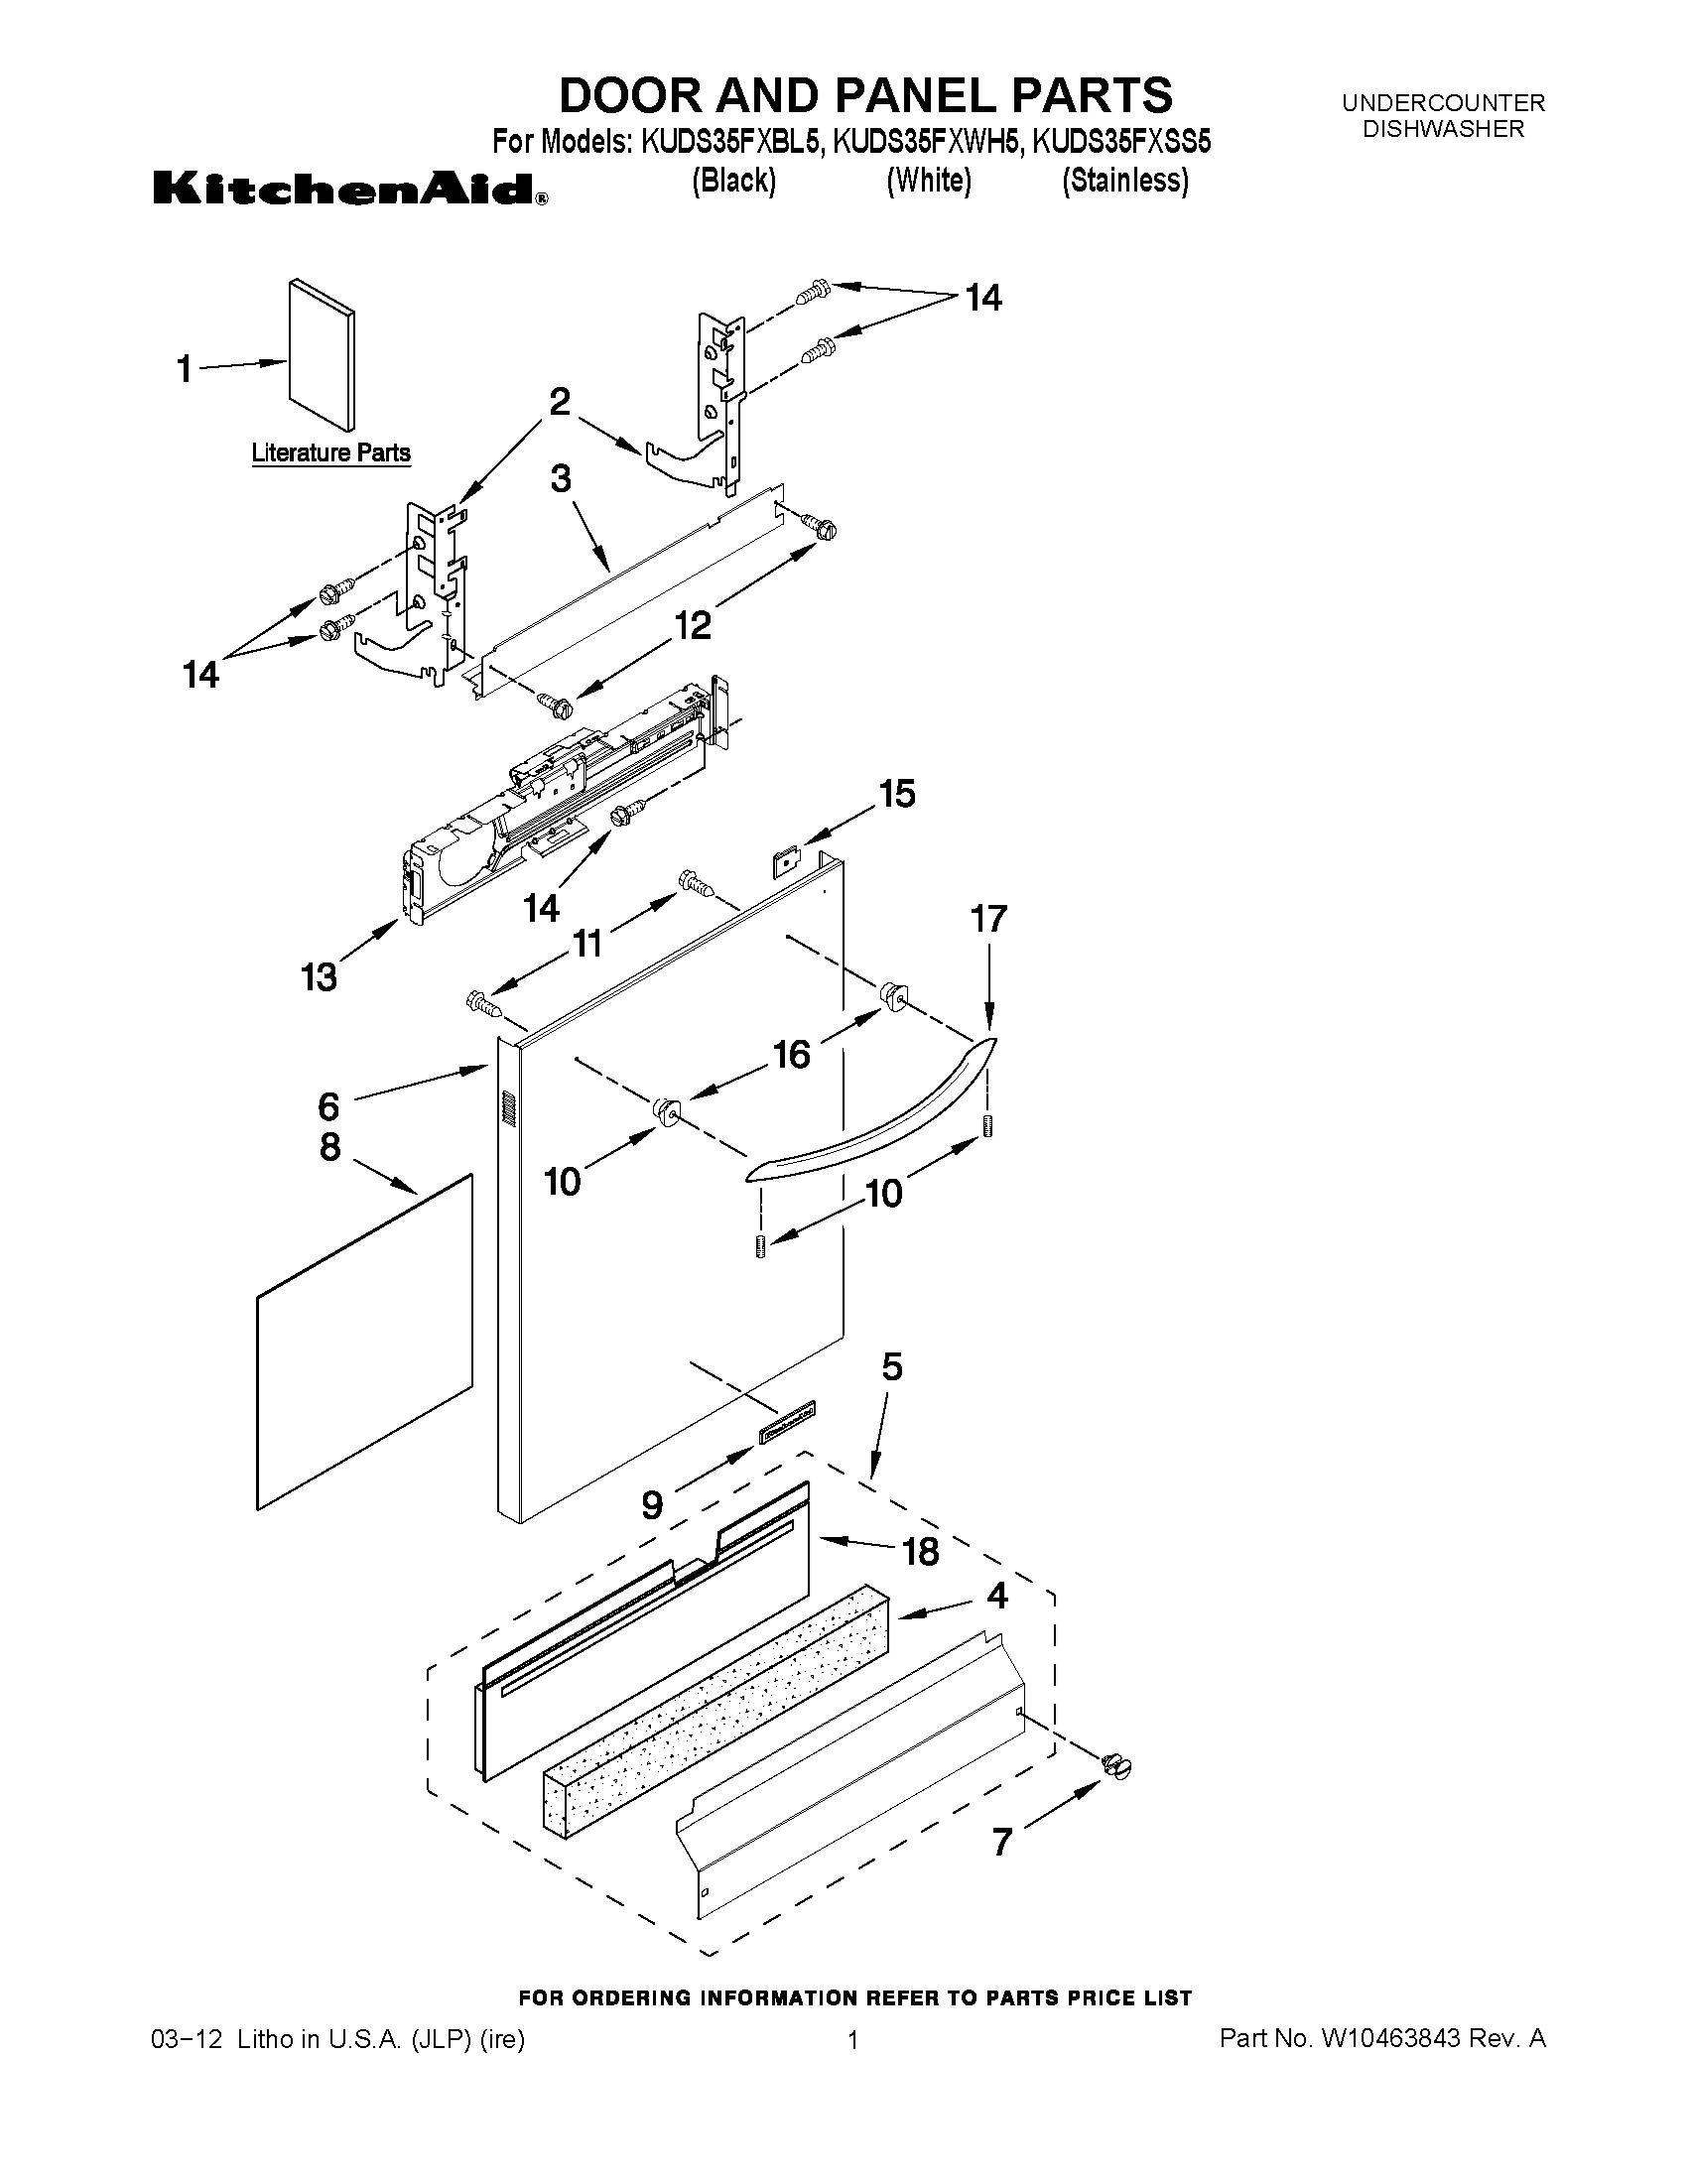 Kitchenaid dishwasher architects series 4-cycle 5-option